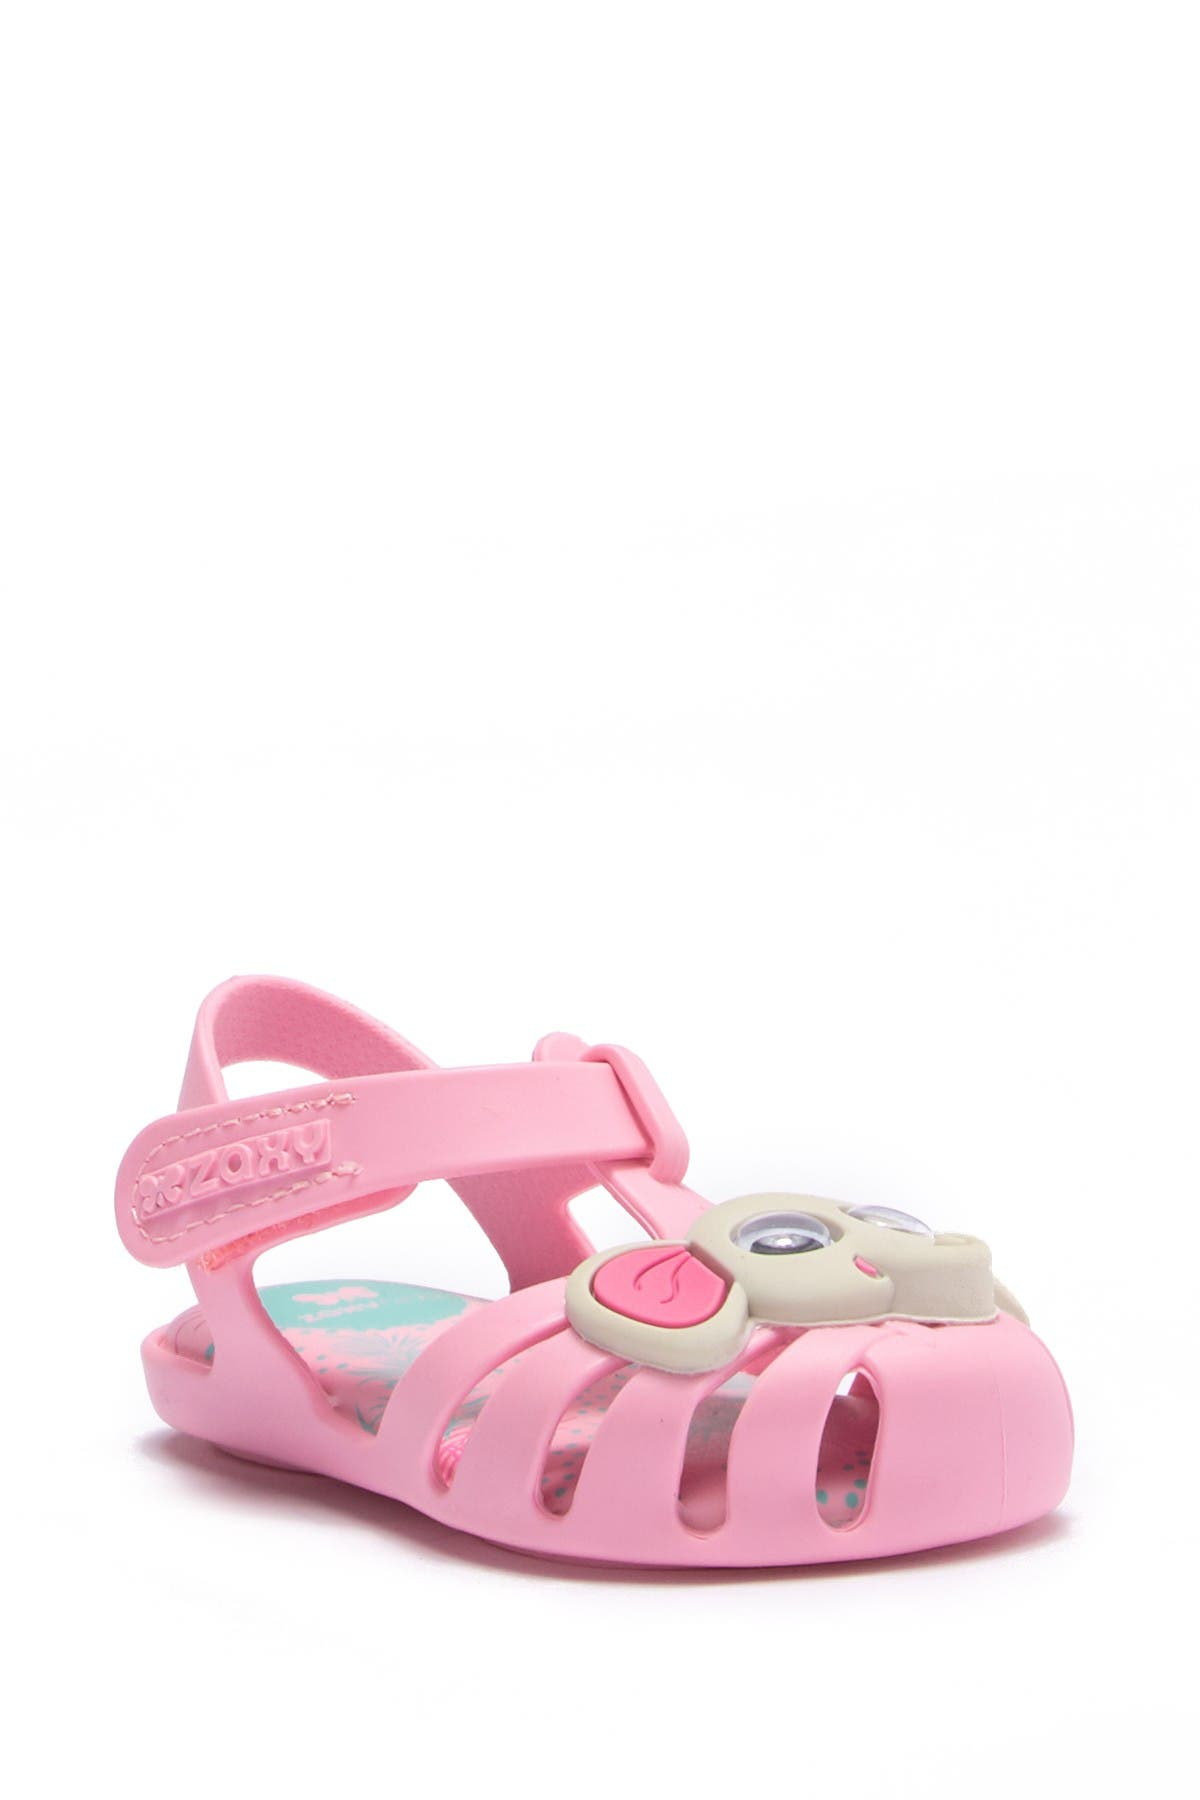 Image of Zaxy BB Animals Eco-Friendly Jelly Sandal